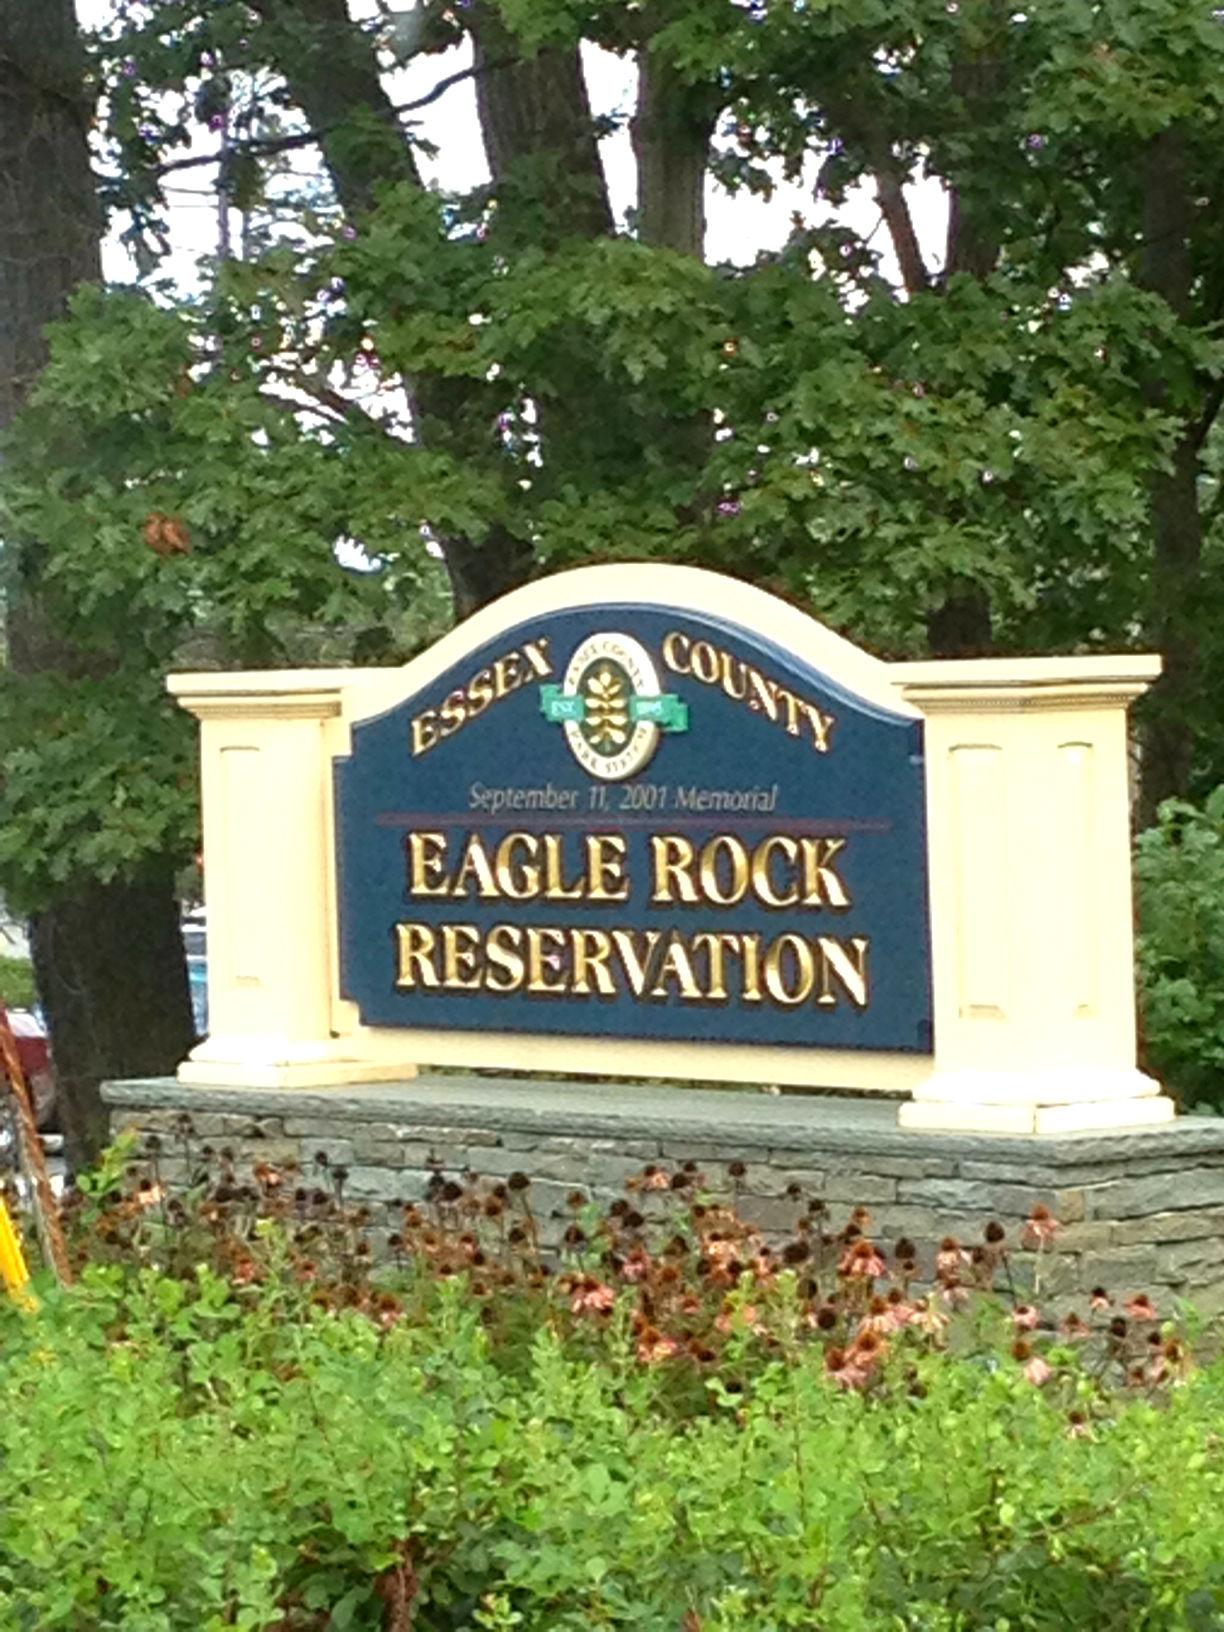 e8d5ccc5ec01875e383a_Eagle_Rock_Reservation_Sign.jpg